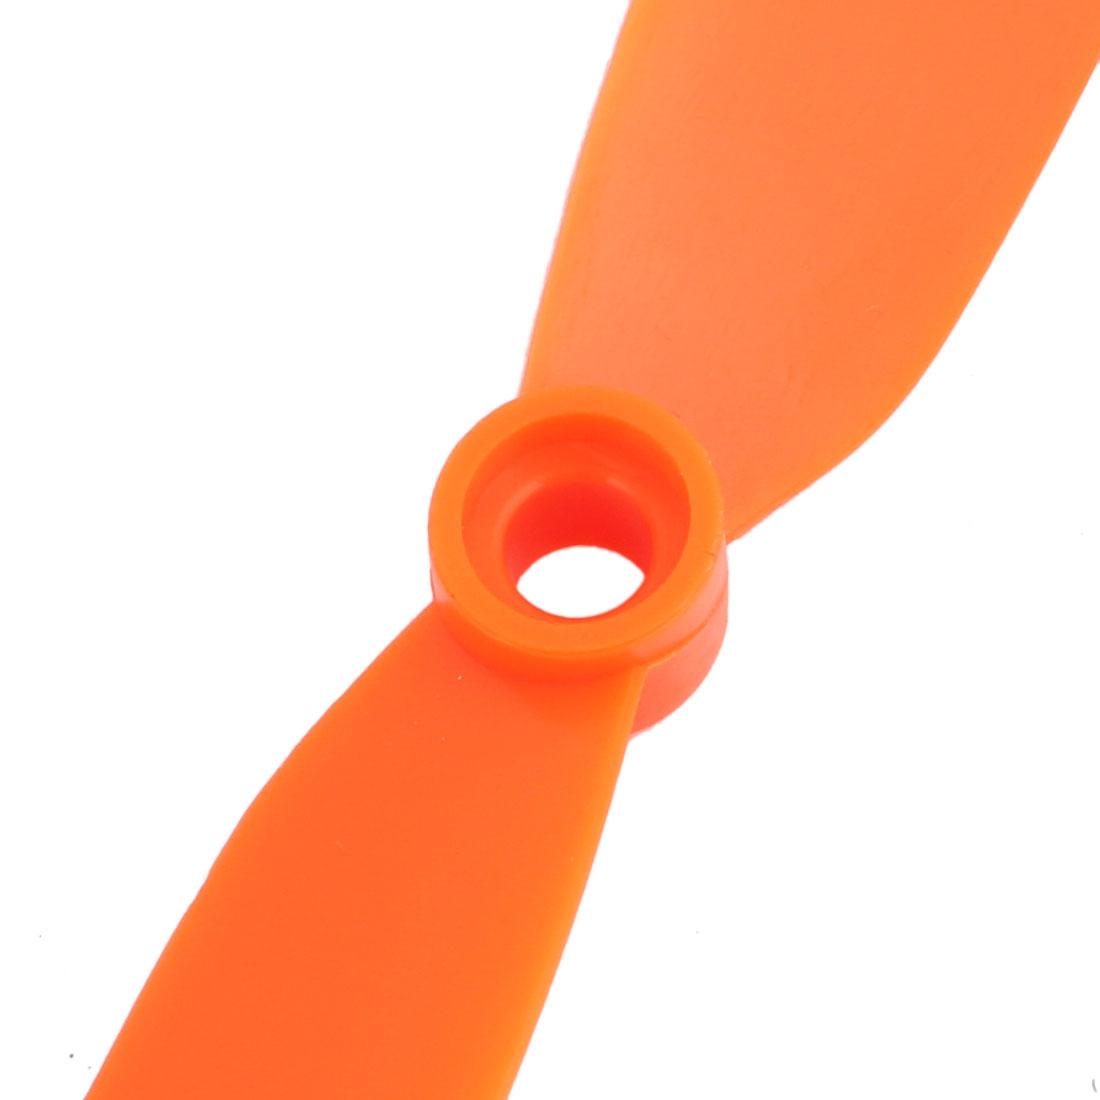 "EP-8060 Vane Aircraft Plane Propeller Flight CW CCW 8"" Orange w Adapter Rings - image 1 de 3"